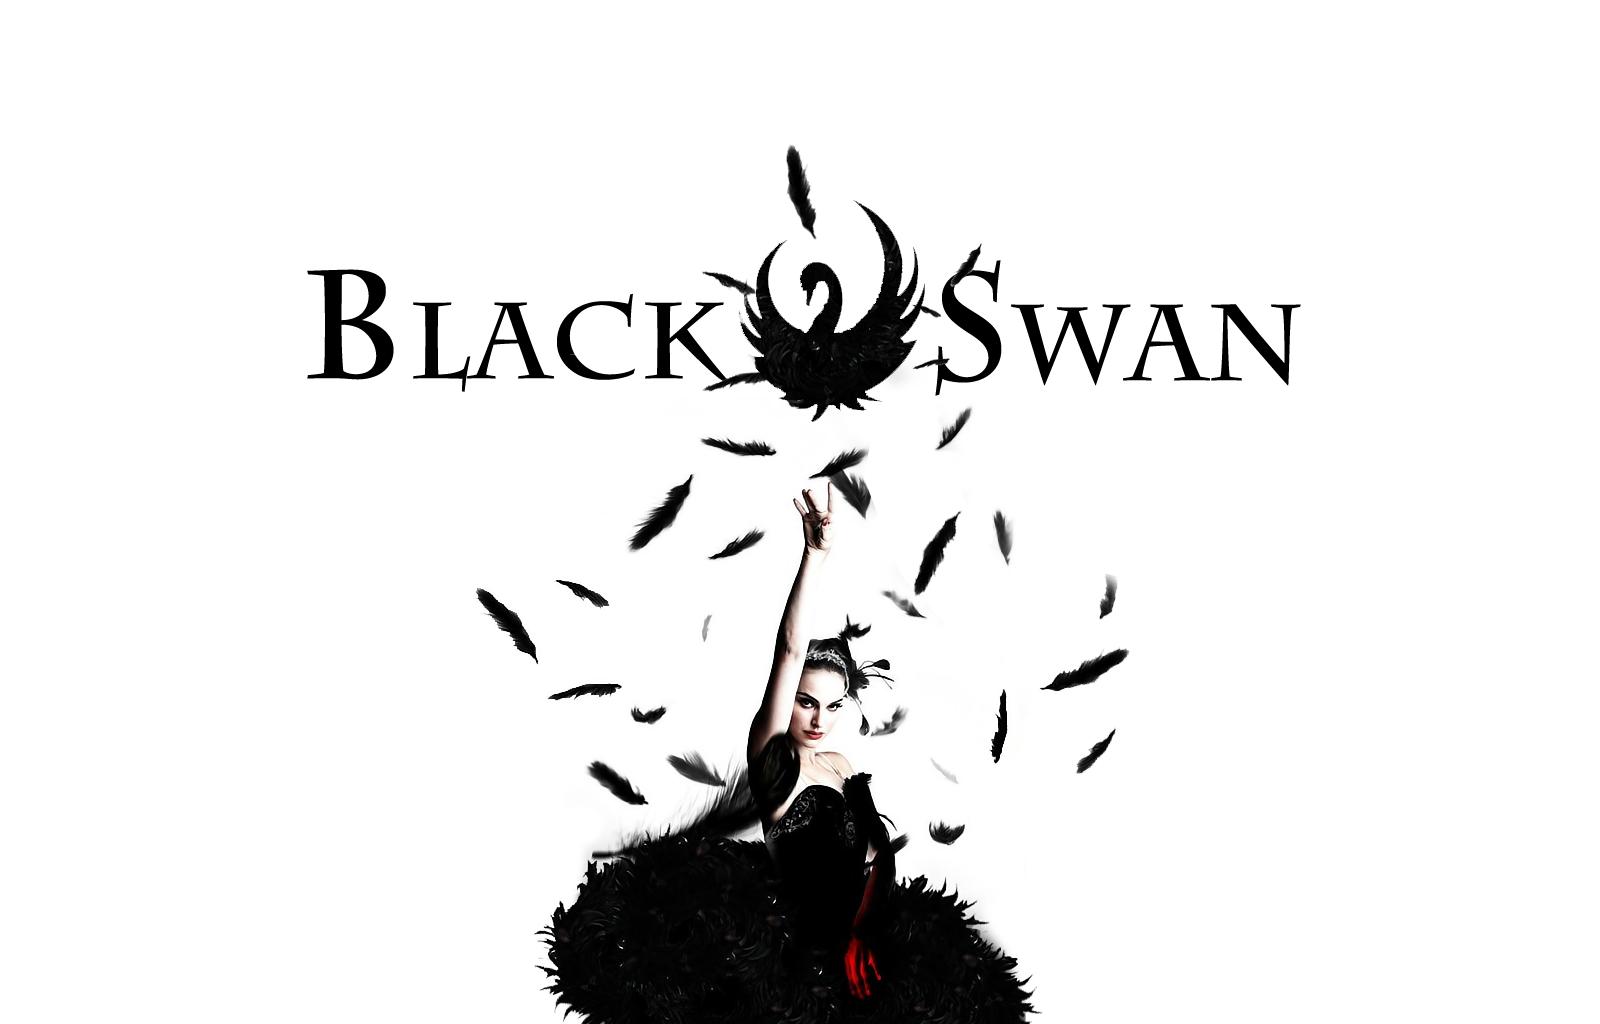 http://2.bp.blogspot.com/-pNxBzm8NX1I/TZCEH-5P4JI/AAAAAAAAACY/wwQHb4nmrAs/s1600/BlackSwan.png